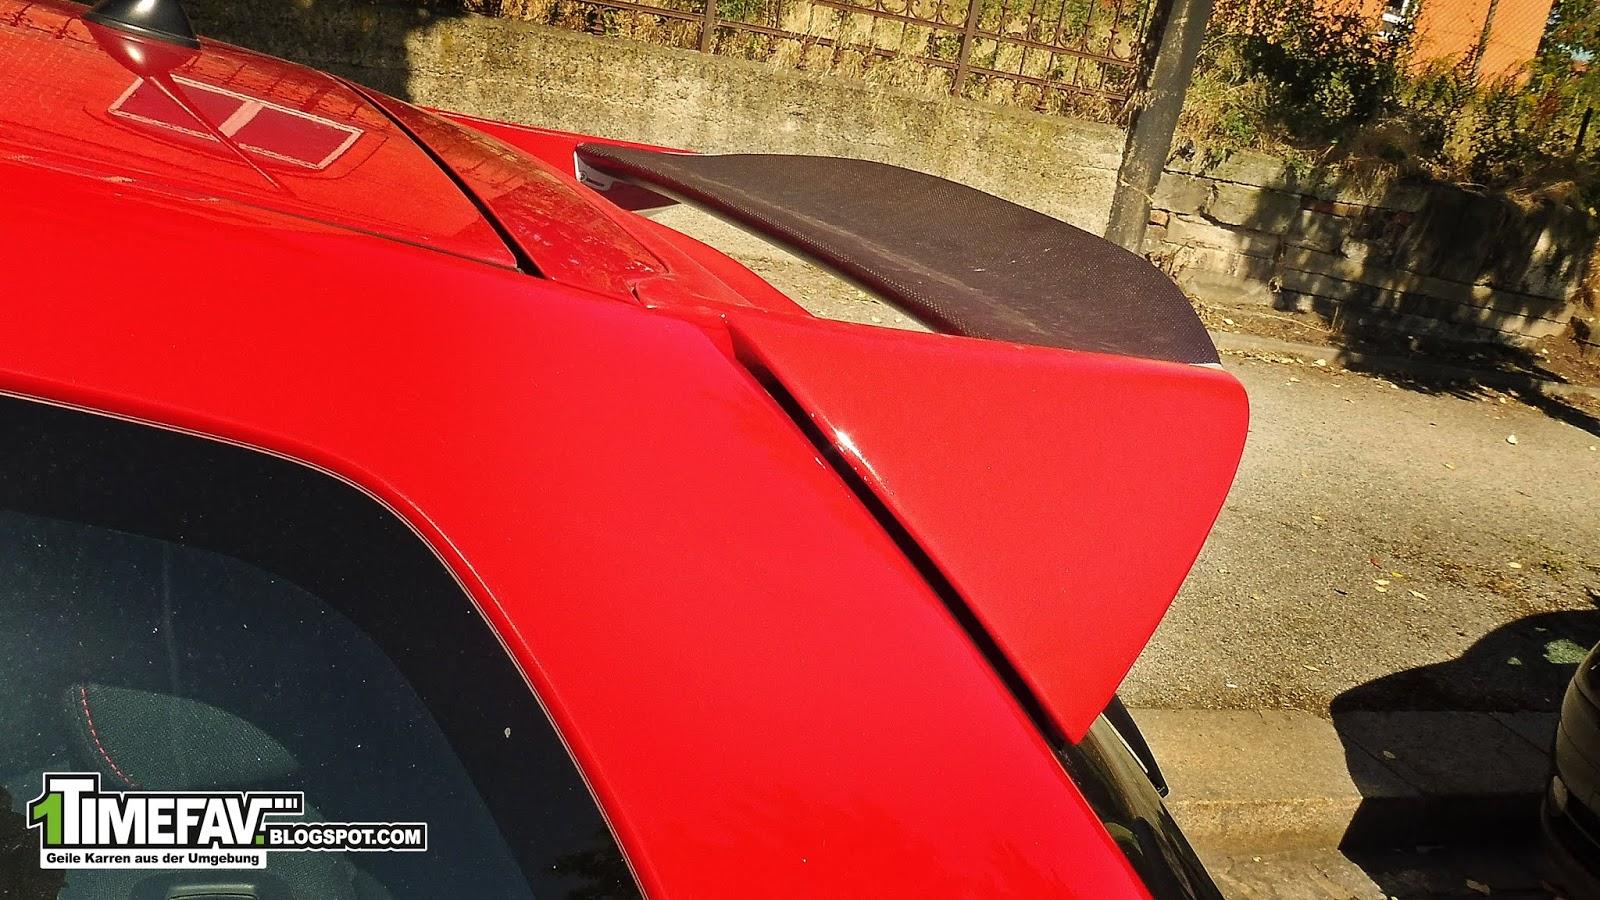 Tss Daily Spoiler >> Tss Daily Spoiler Top Car Release 2020